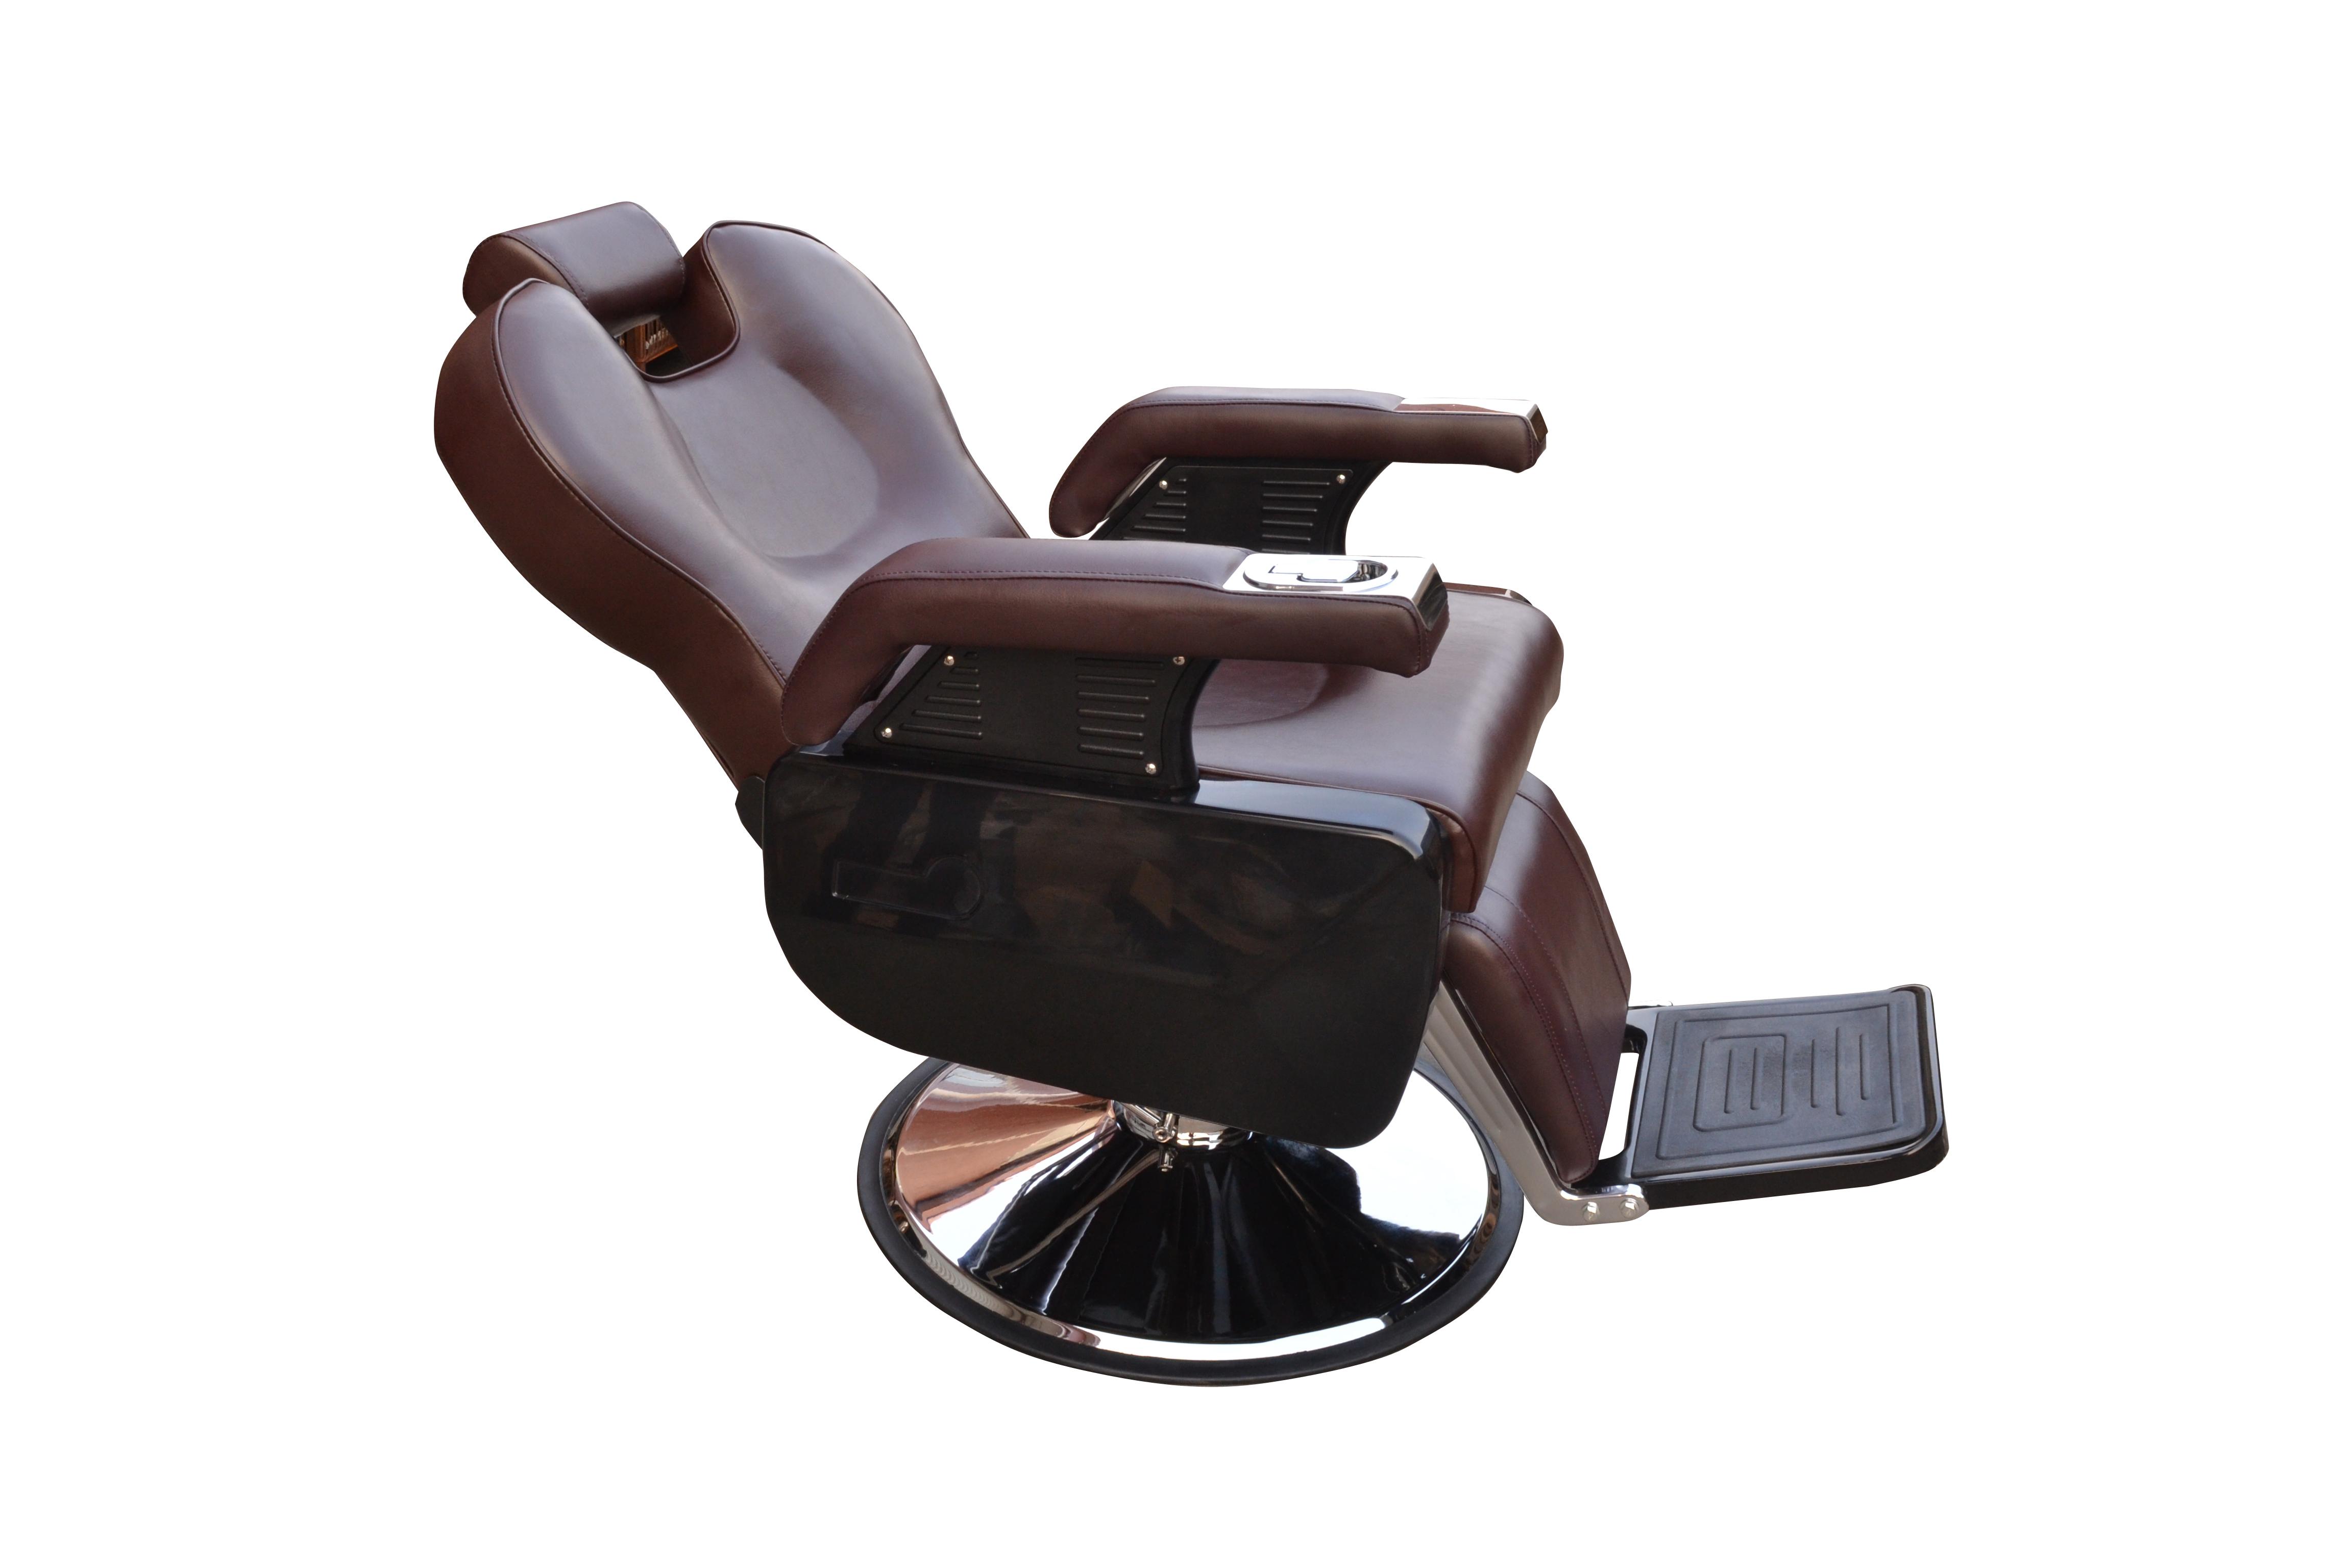 BarberPub All Purpose Hydraulic Recline Barber Chair Salon Beauty Spa 8702 Brown 14